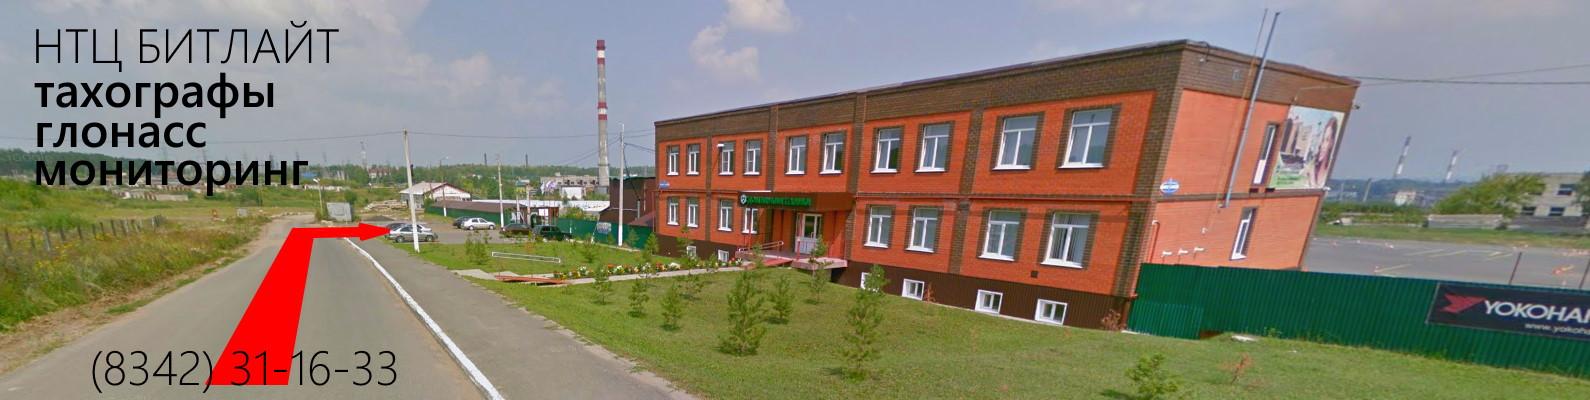 "Тахографы, блоки СКЗИ и ГЛОНАСС мониторинг в Саранск. Мастерская Научно-технического центра ""БИТЛАЙТ""."